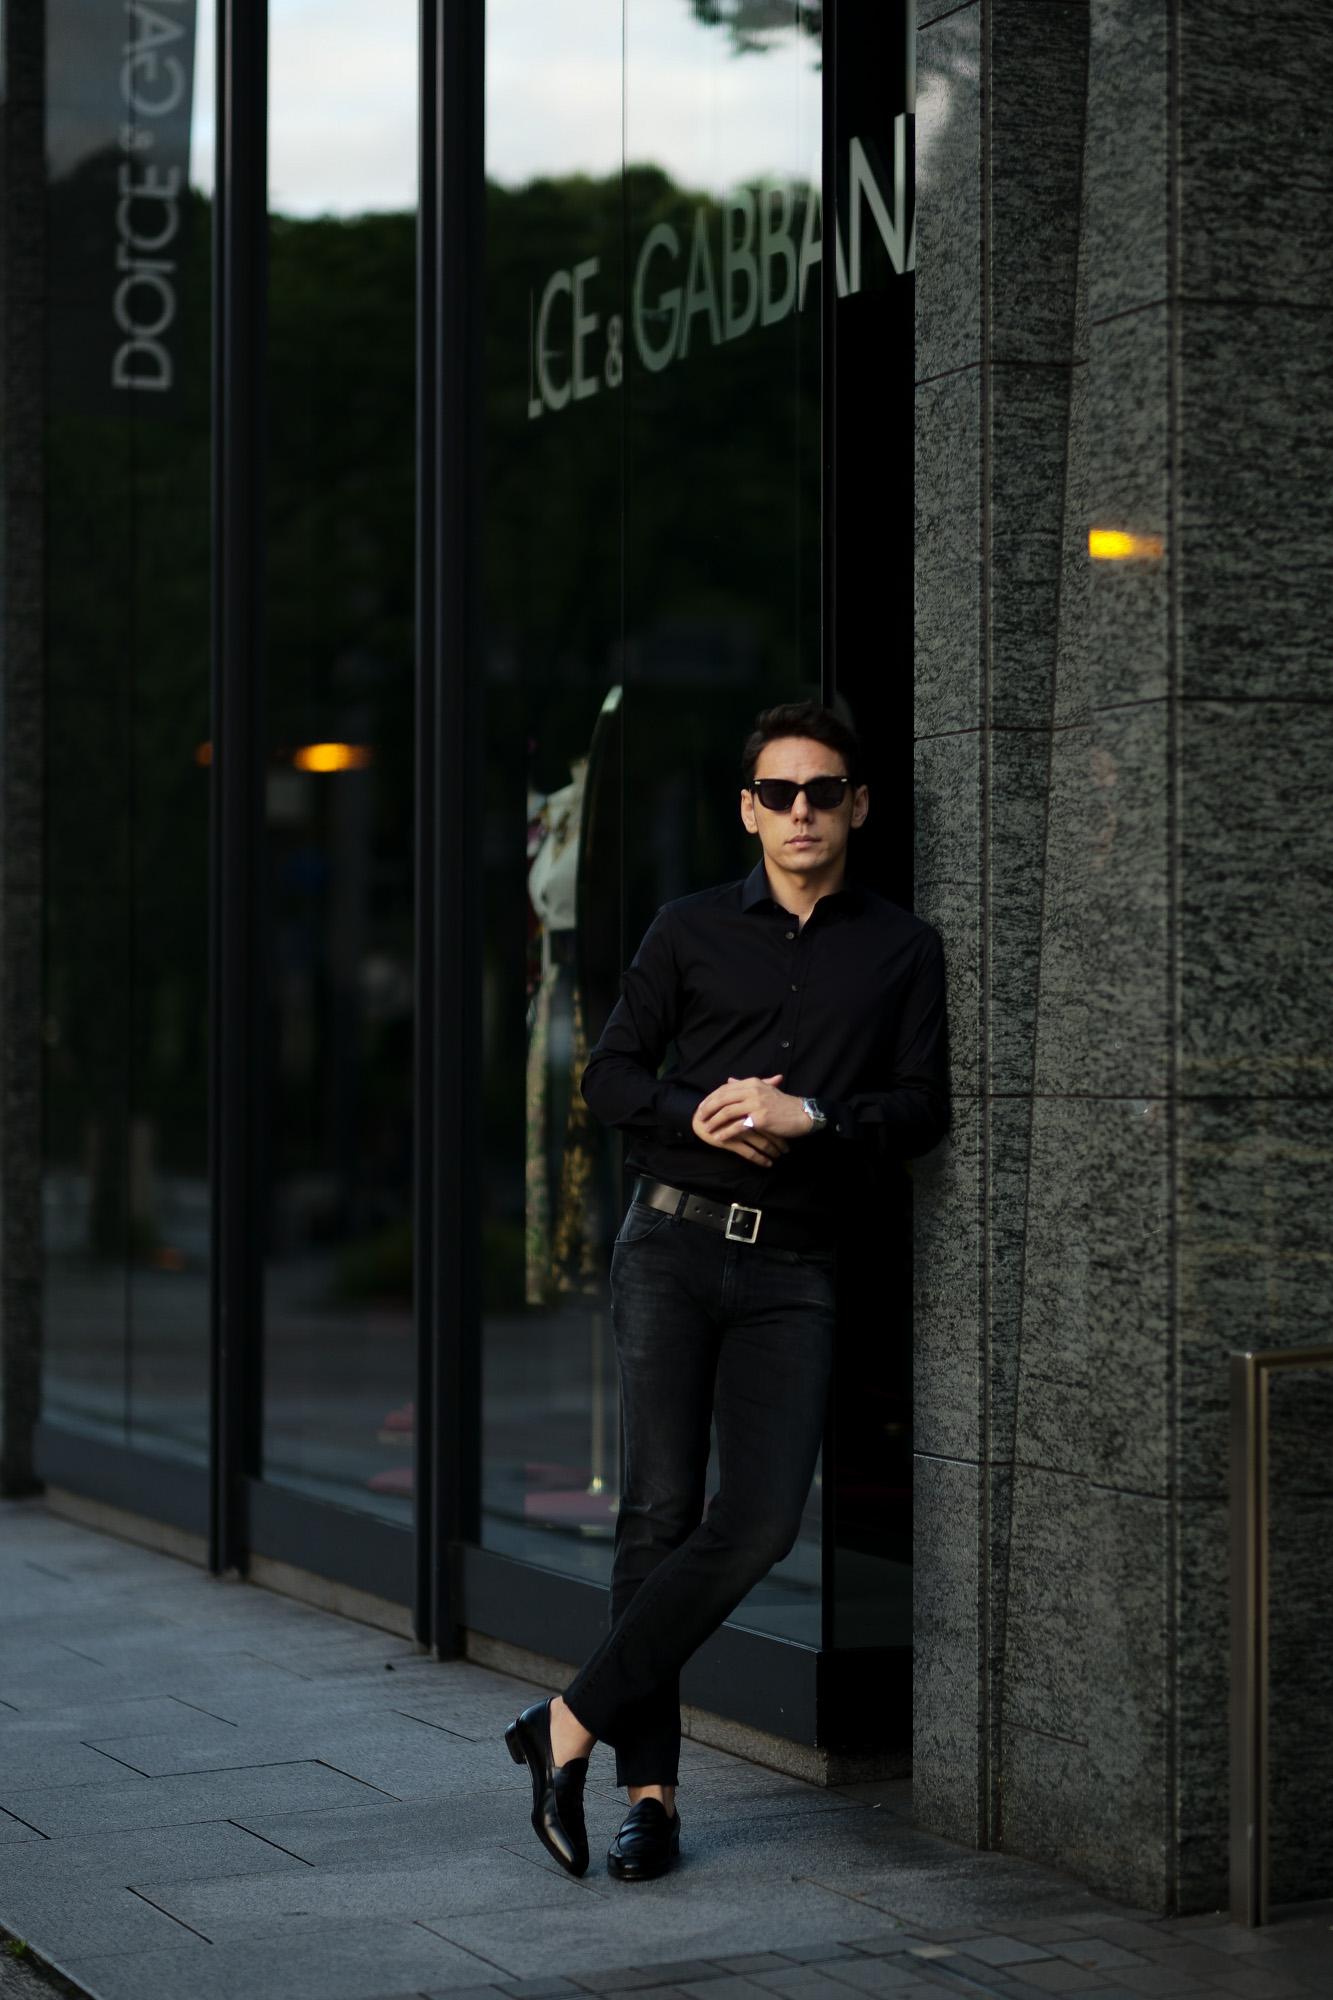 FIXER (フィクサー) FST-01 Broad Dress Shirts ストレッチコットン ブロード シャツ BLACK (ブラック) 【ご予約開始】愛知 名古屋 Alto e Diritto altoediritto アルトエデリット 黒シャツ ブラックシャツ